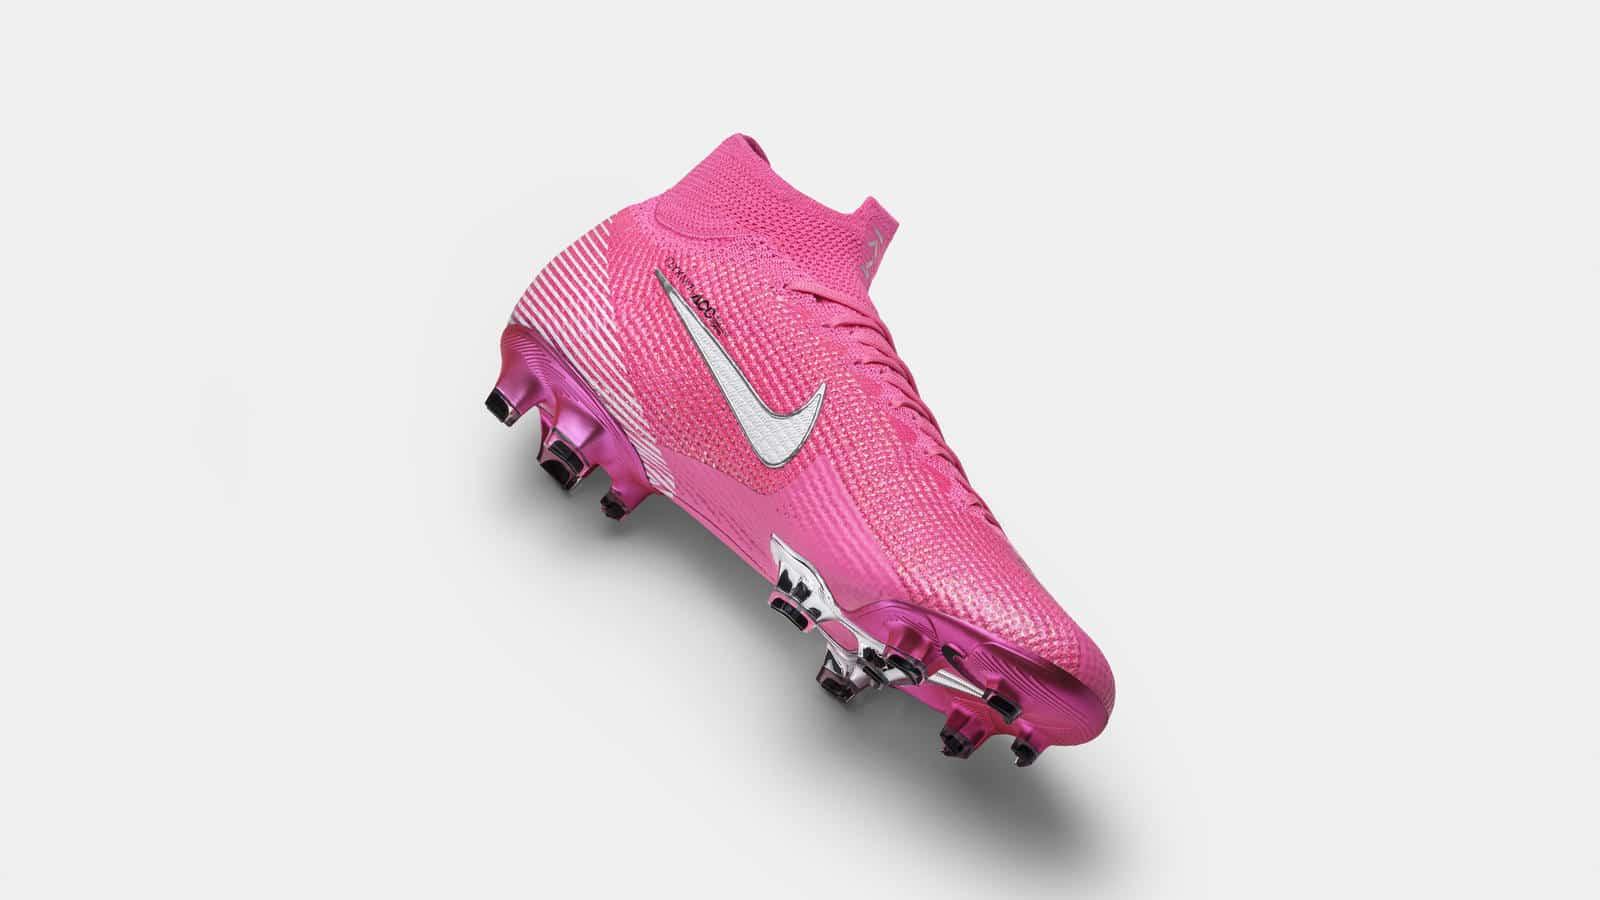 chaussure de foot rose nike